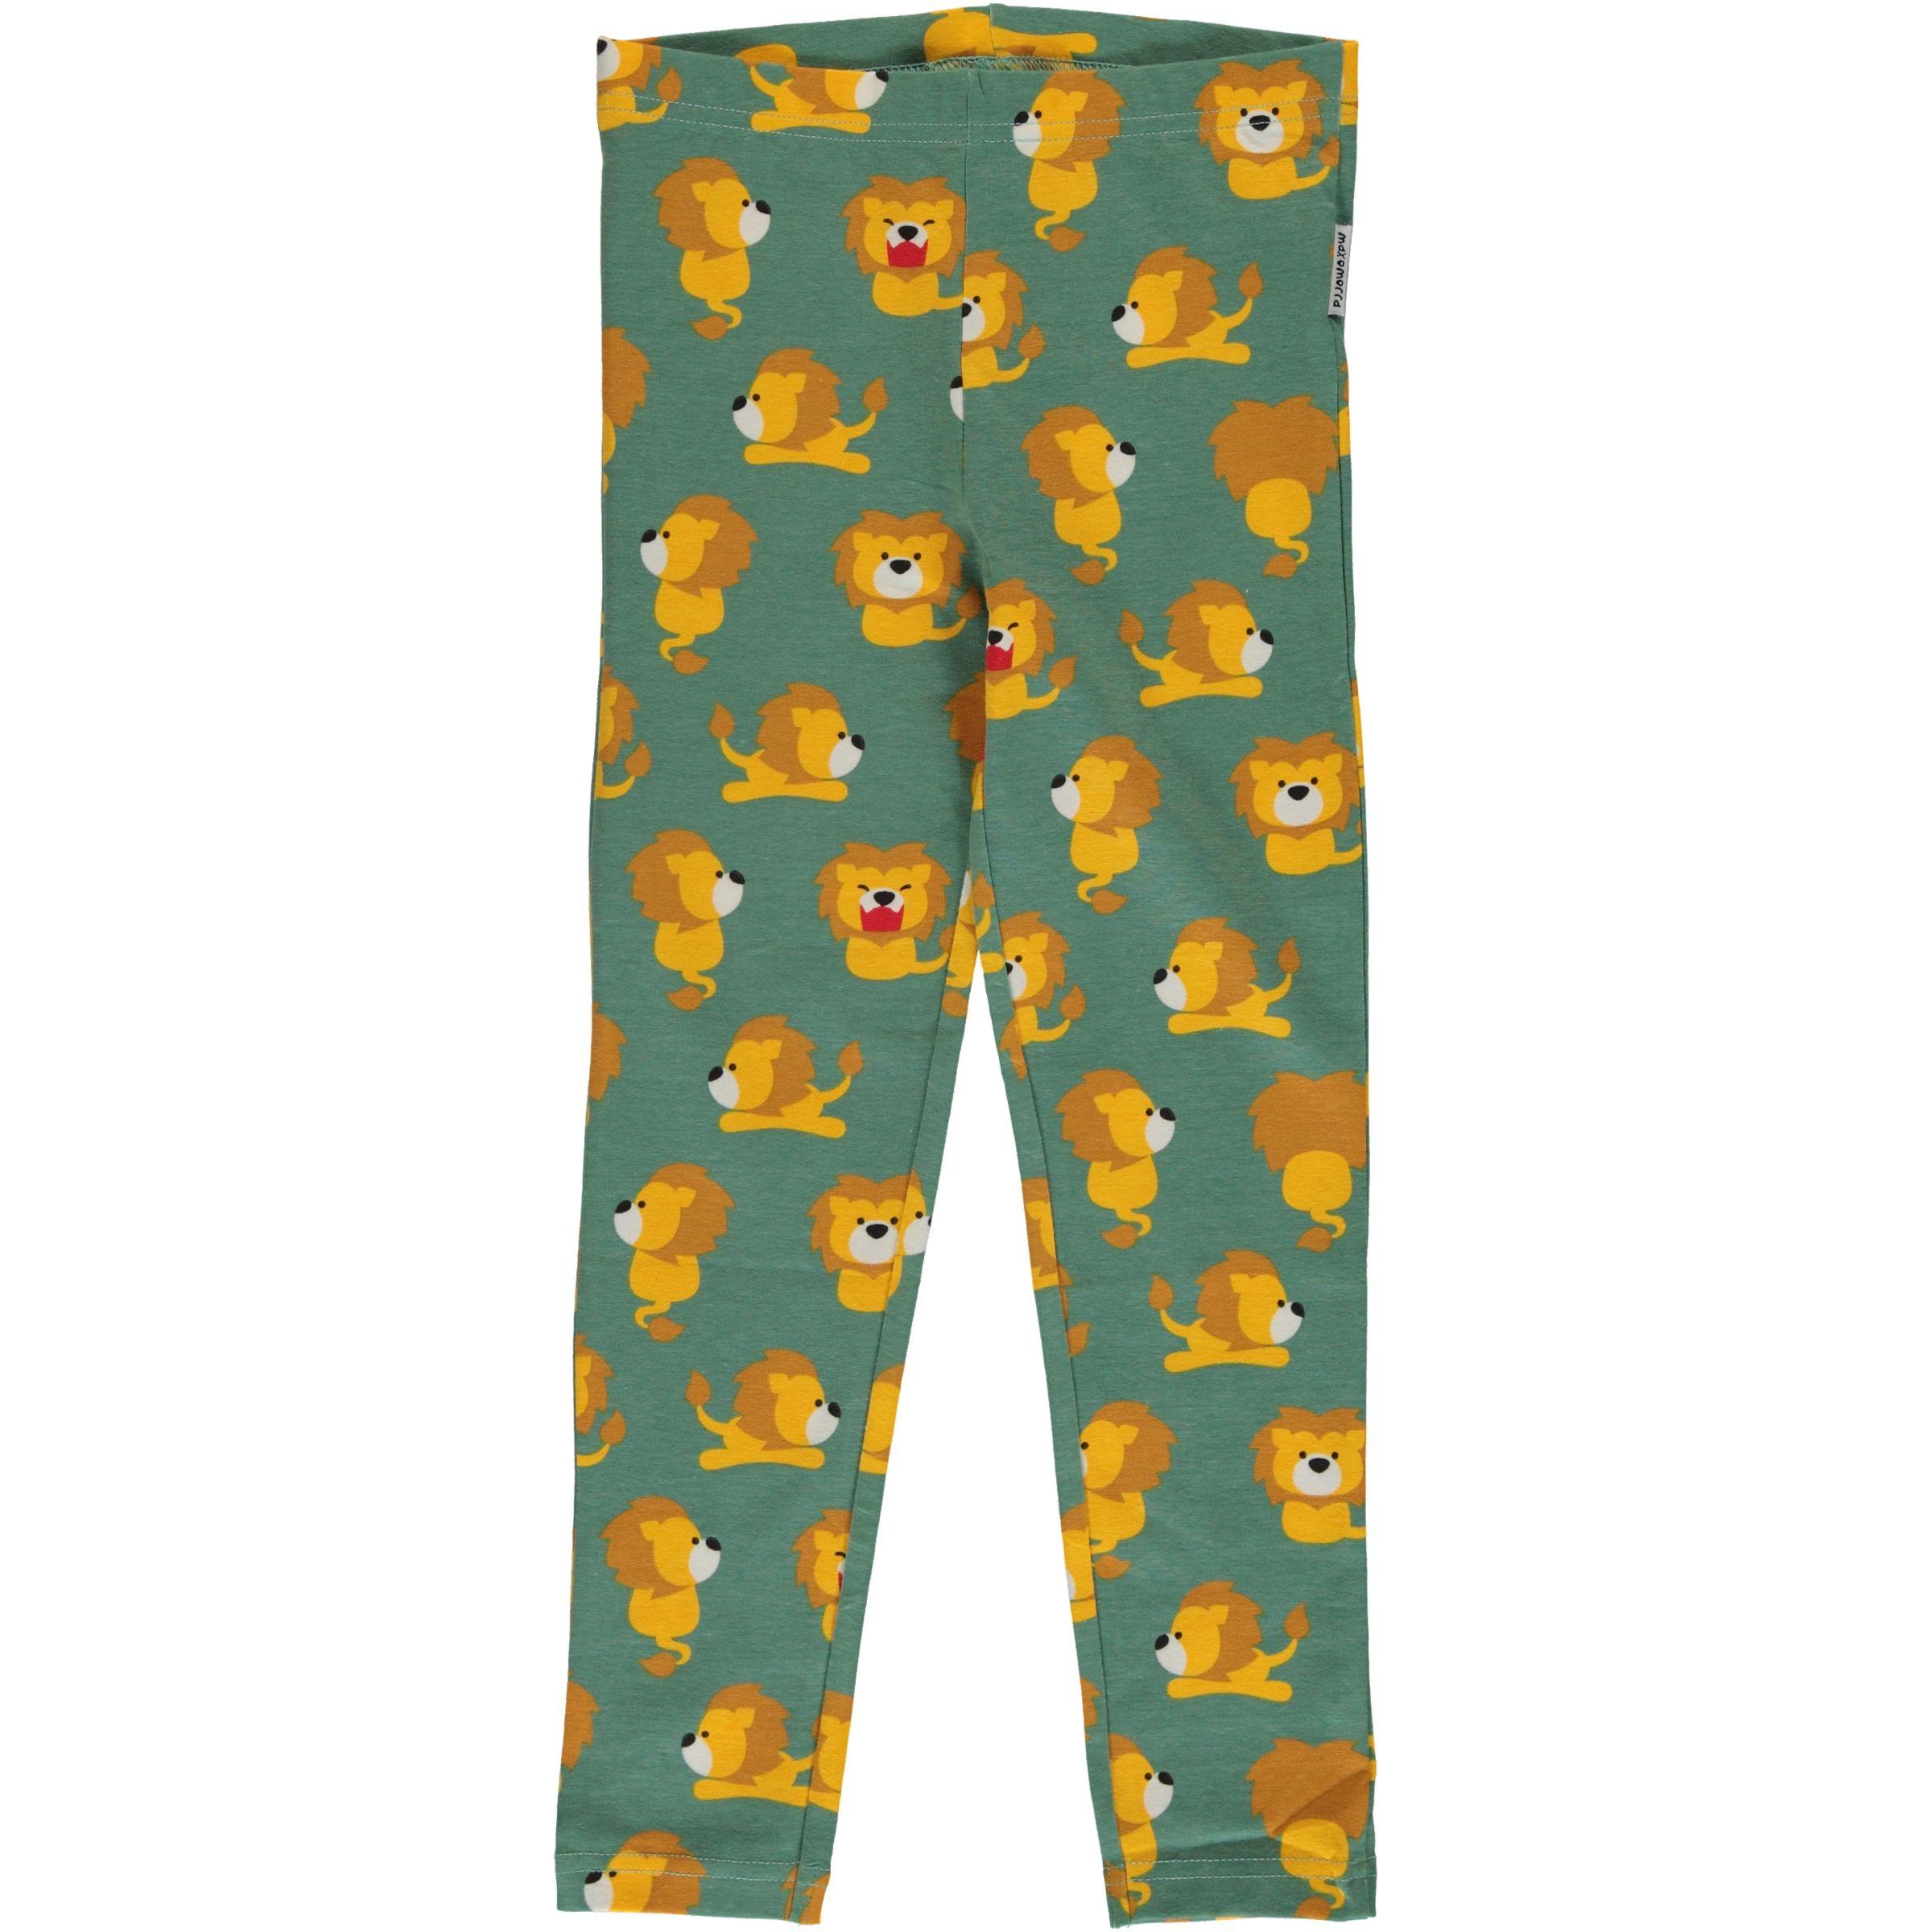 a769c76c04924 Lion organic cotton leggings from Maxomorra | Uni and Jack